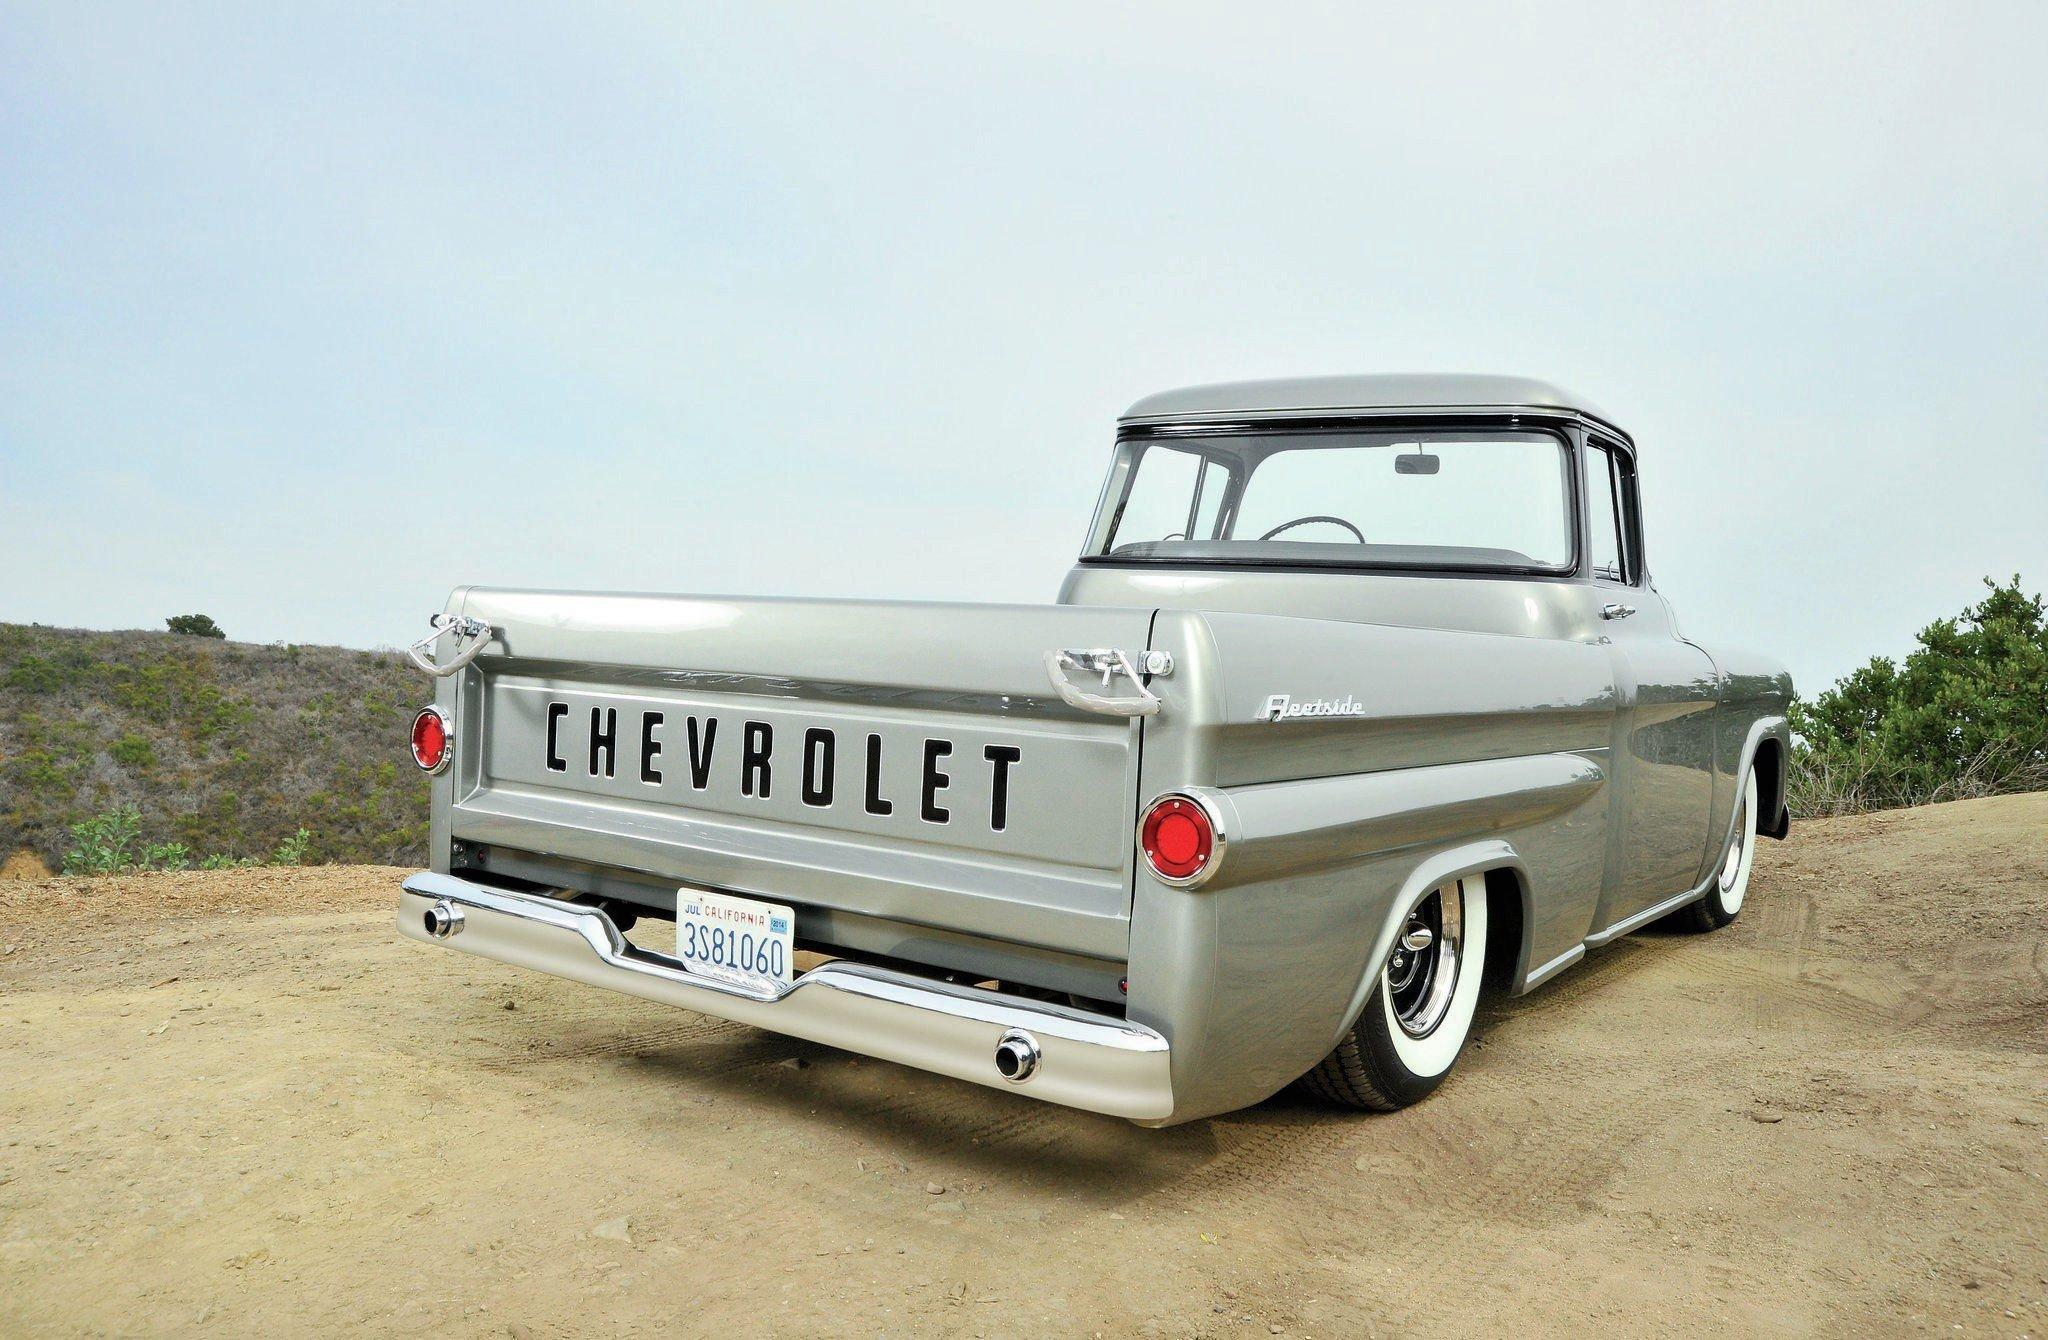 1959 Chevrolet Fleetside Pickup-02 wallpaper